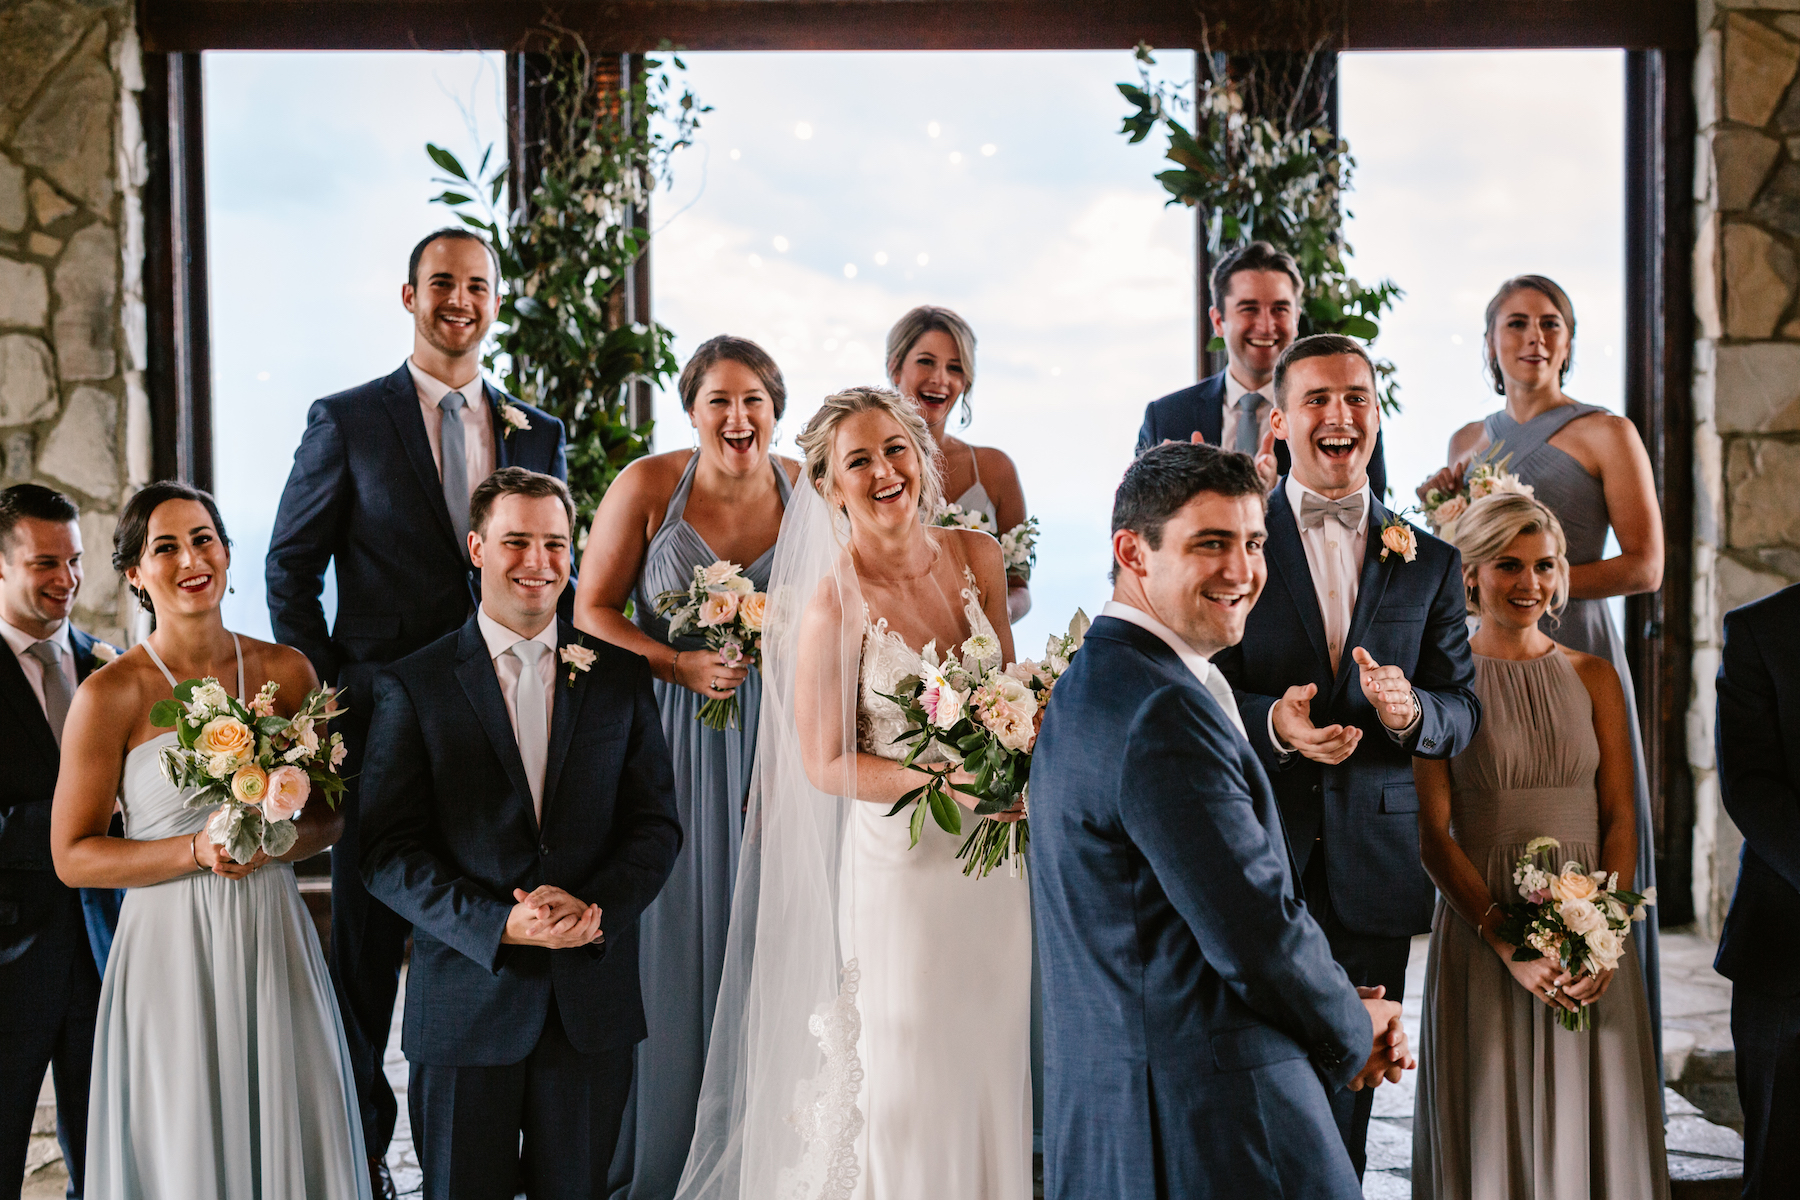 wedding-engagement-photographer-spartanburg-greenville-columbia-carolina-south-north-503.JPG